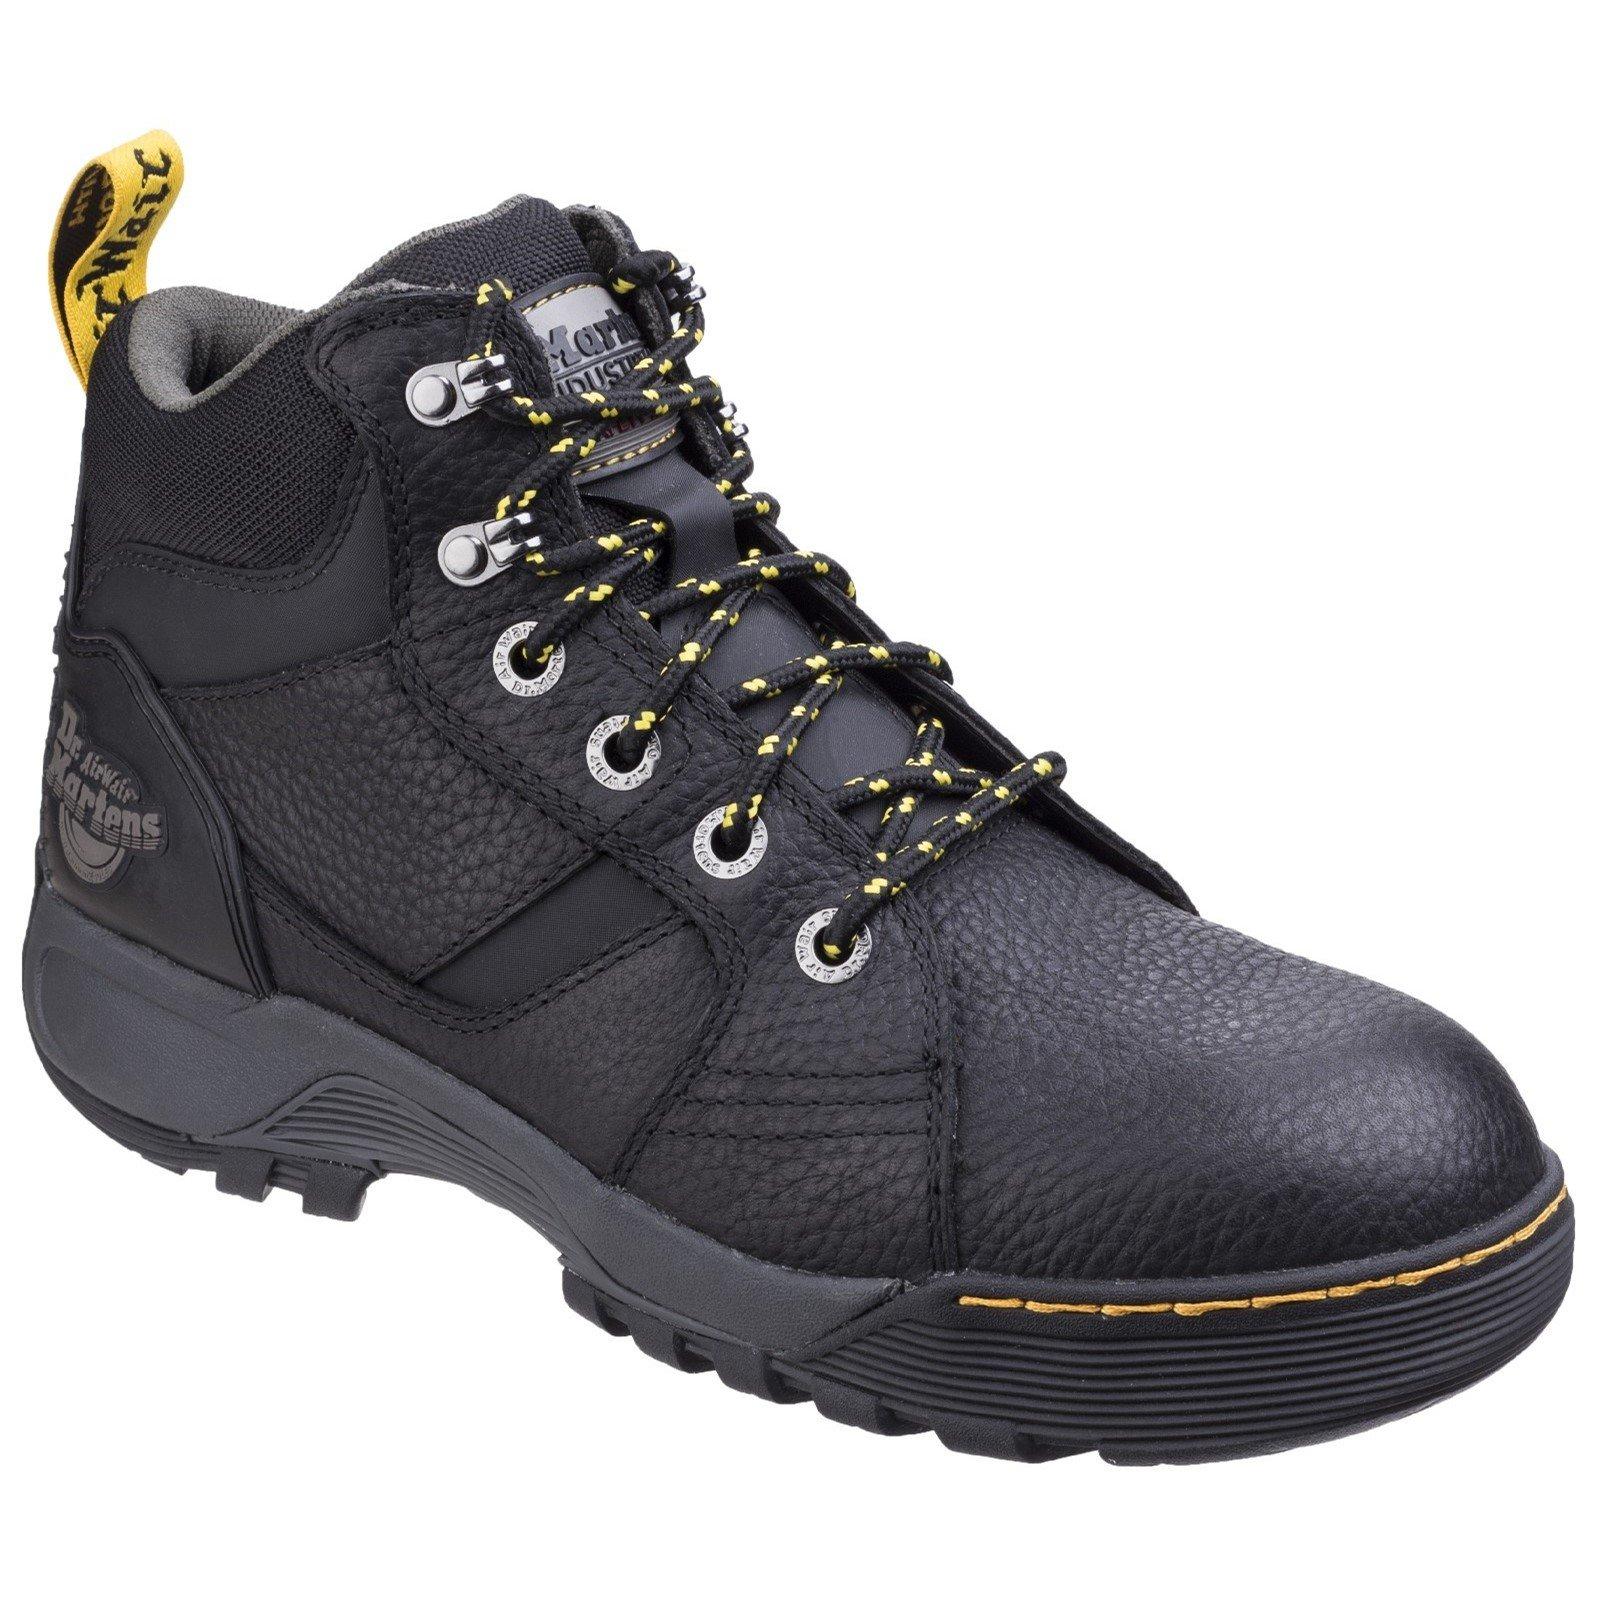 Dr Martens Men's Grapple Safety Boot Various Colours 26023 - Black 9